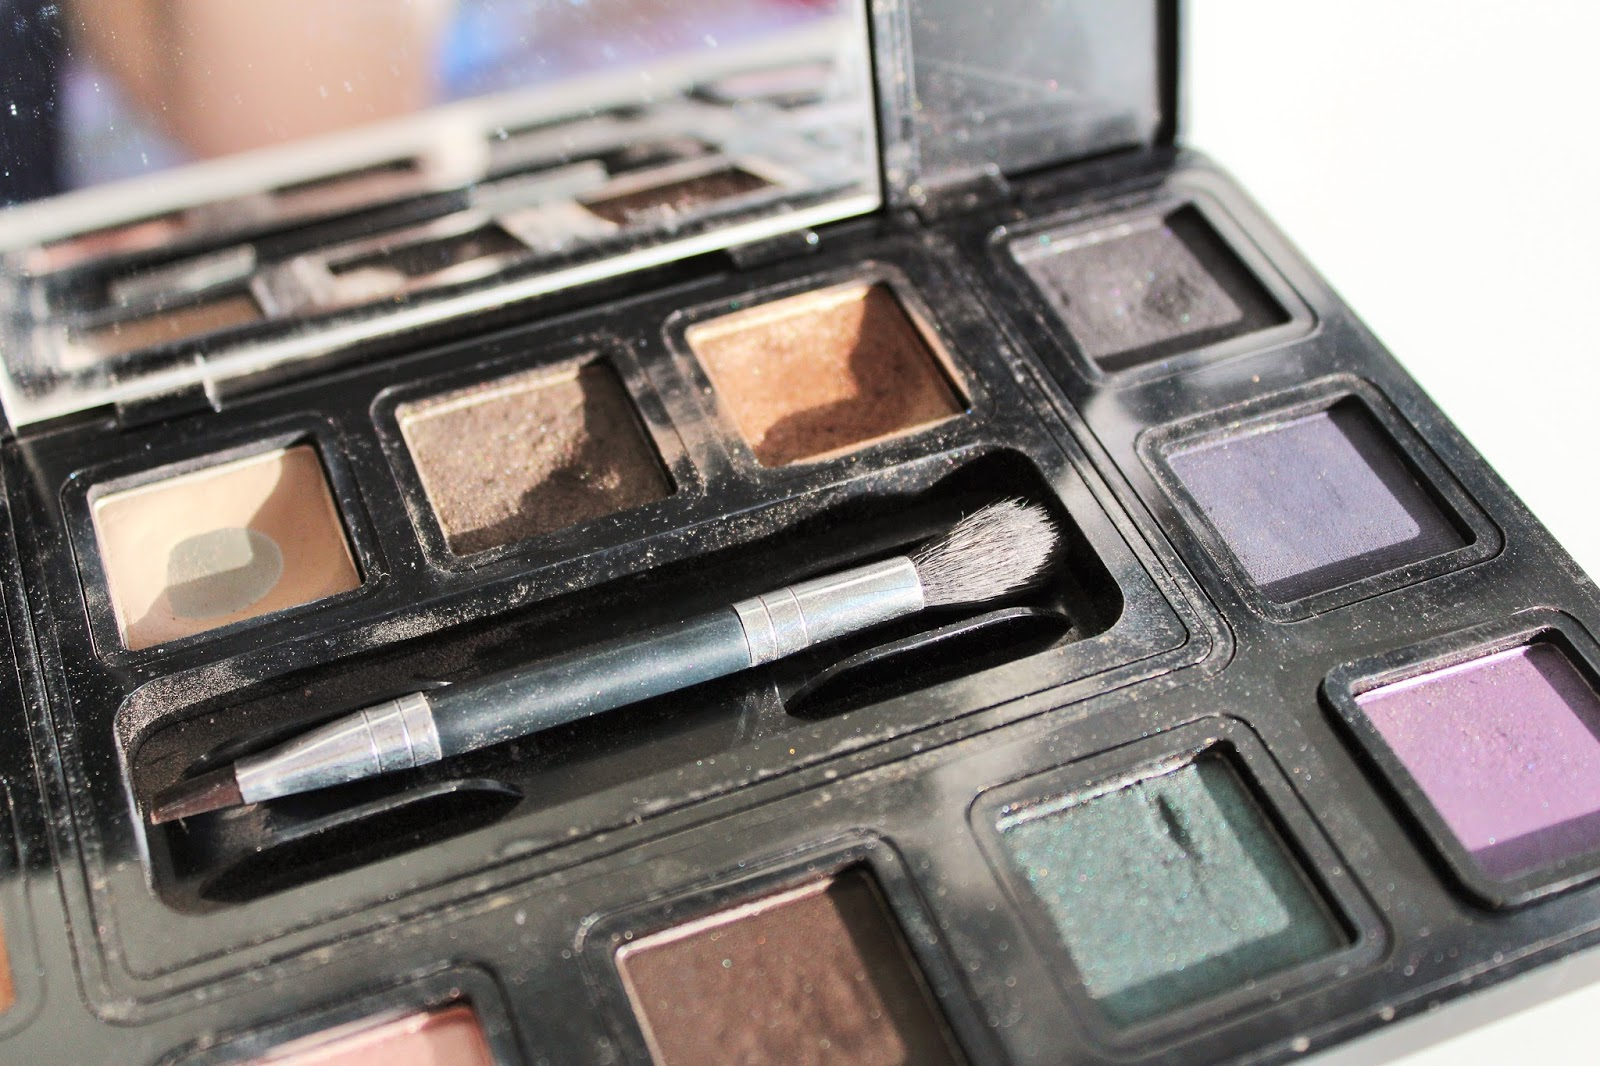 BareMinerals Eyeshadow kit